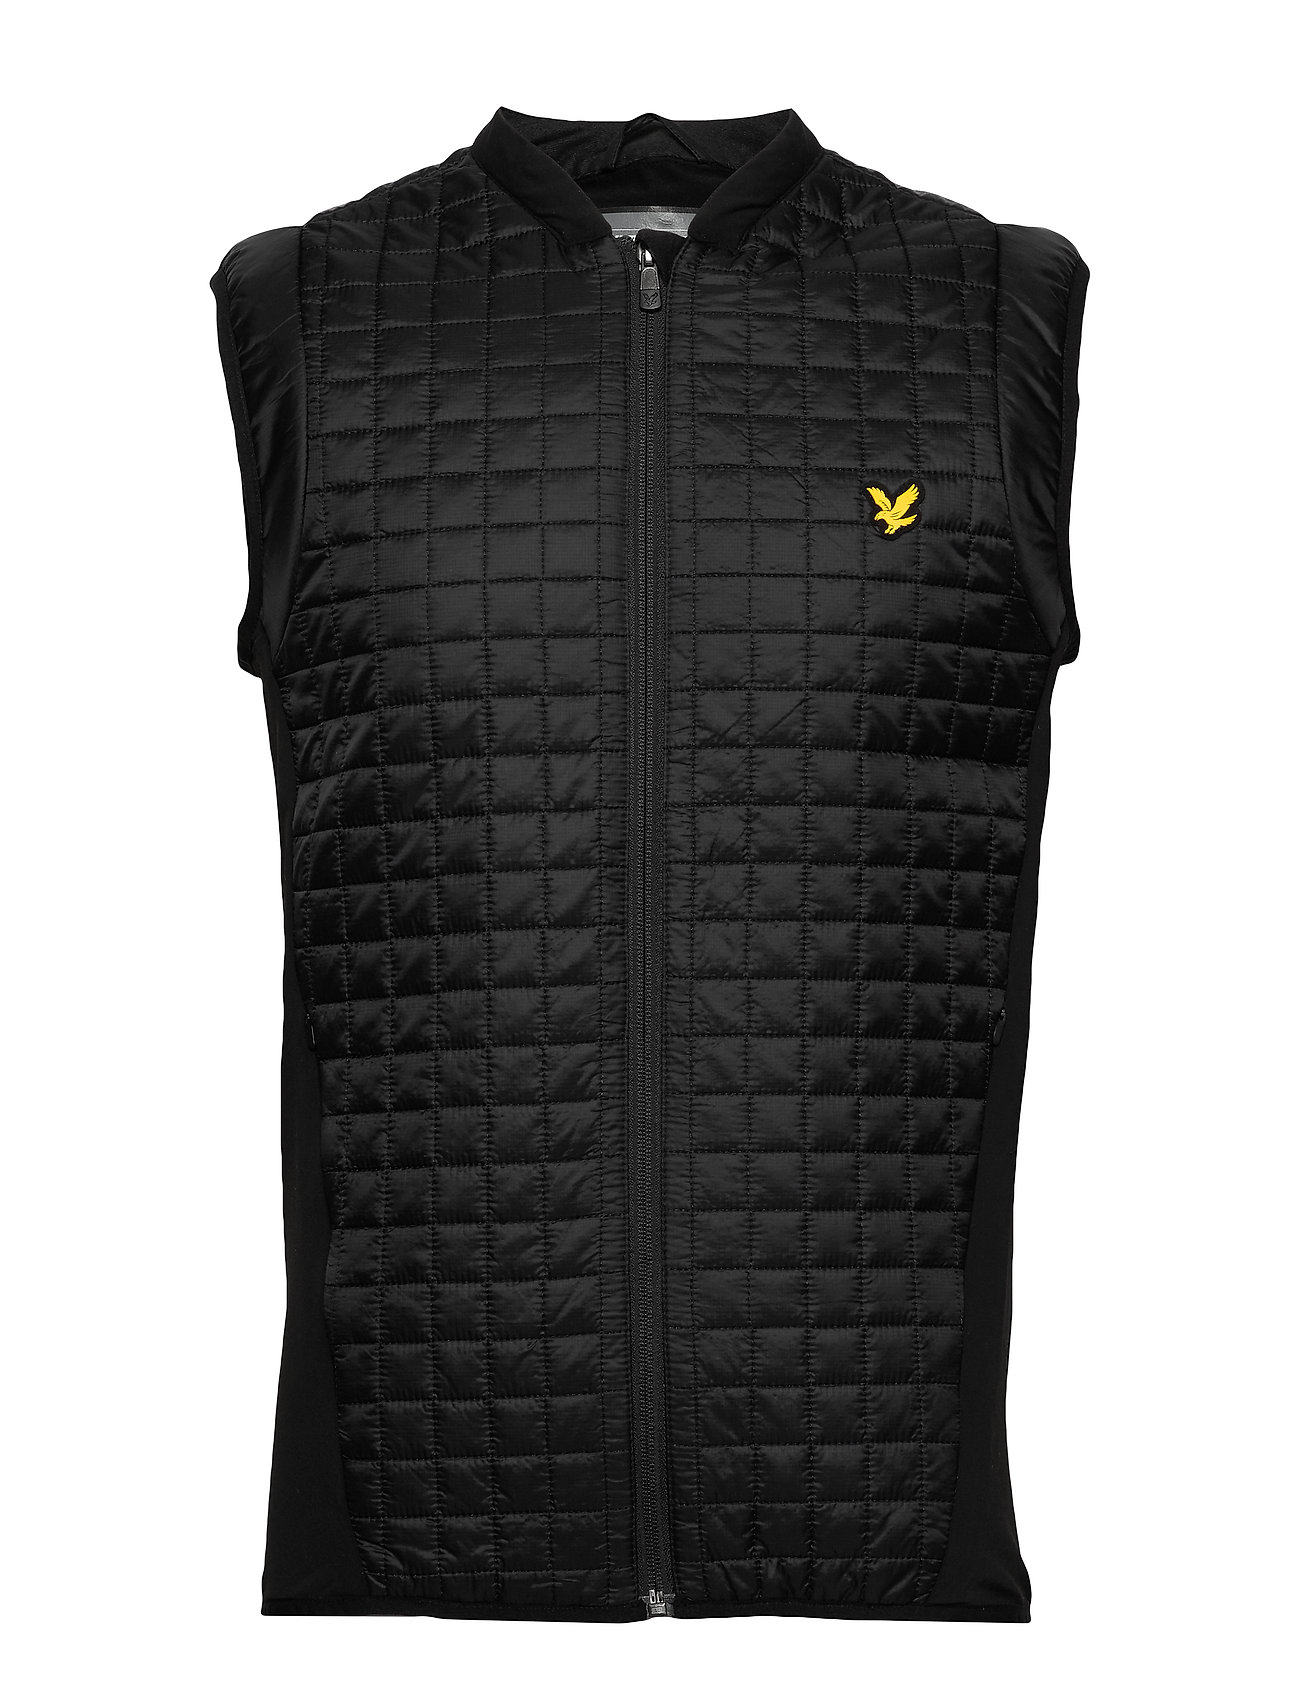 Image of Terrain Gilet Vest Sort Lyle & Scott Sport (3334143217)